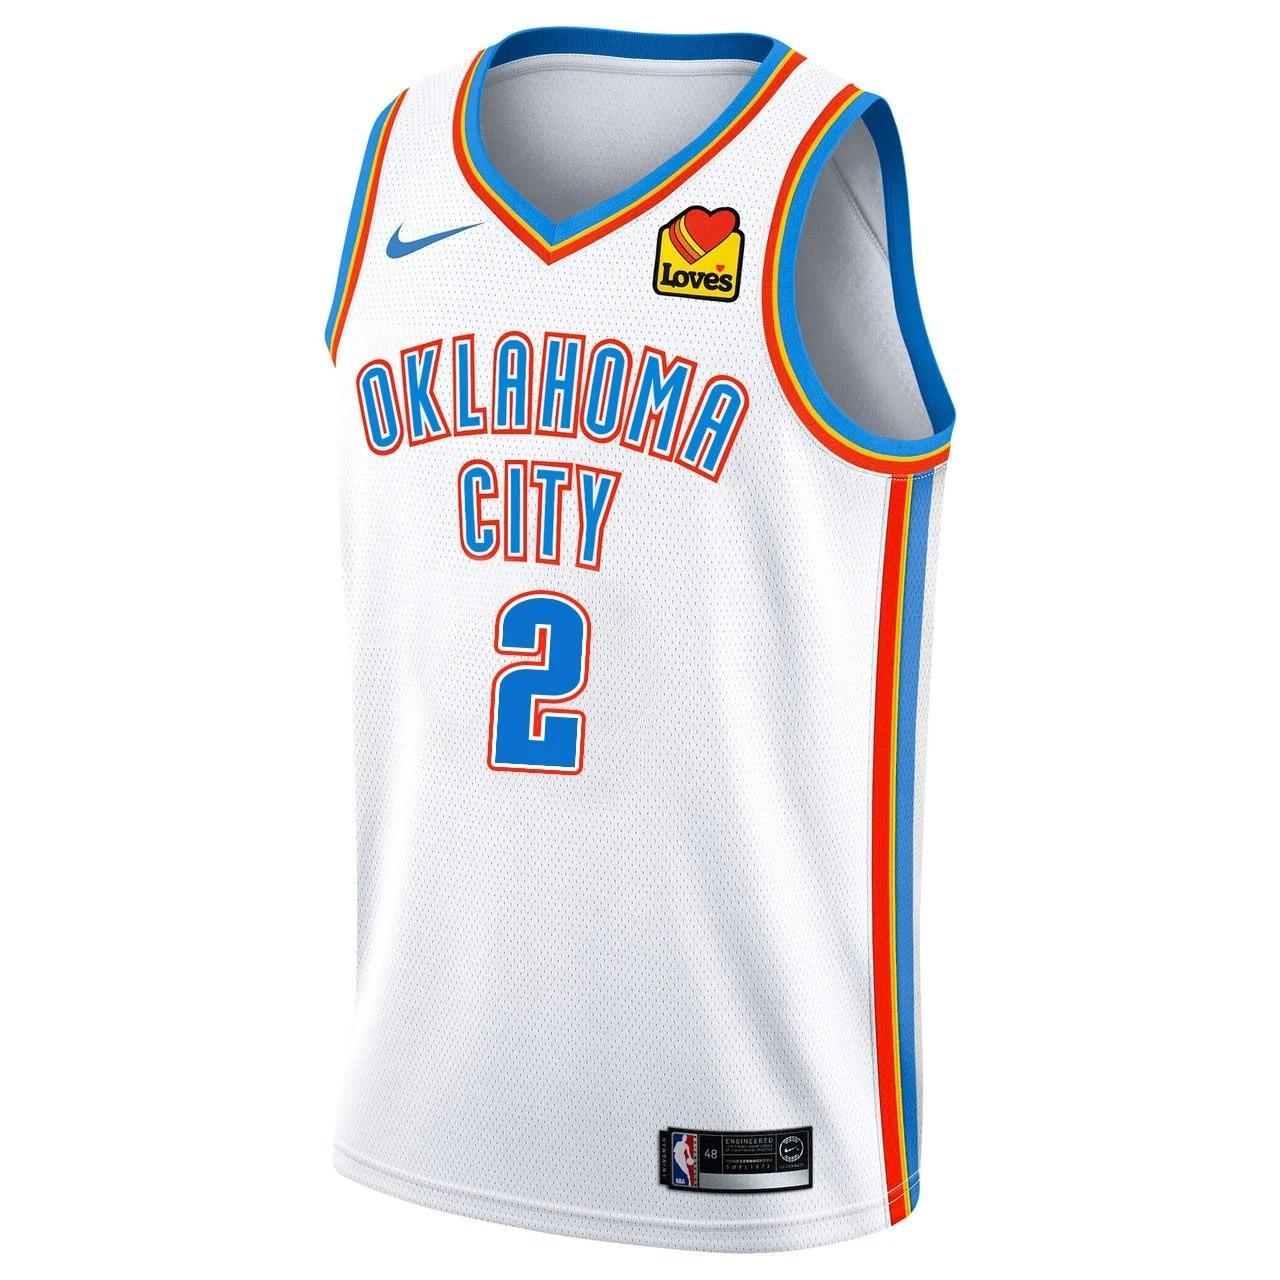 Regata Nike Oklahoma City Thunder Association Edition 2020/21 Swingman